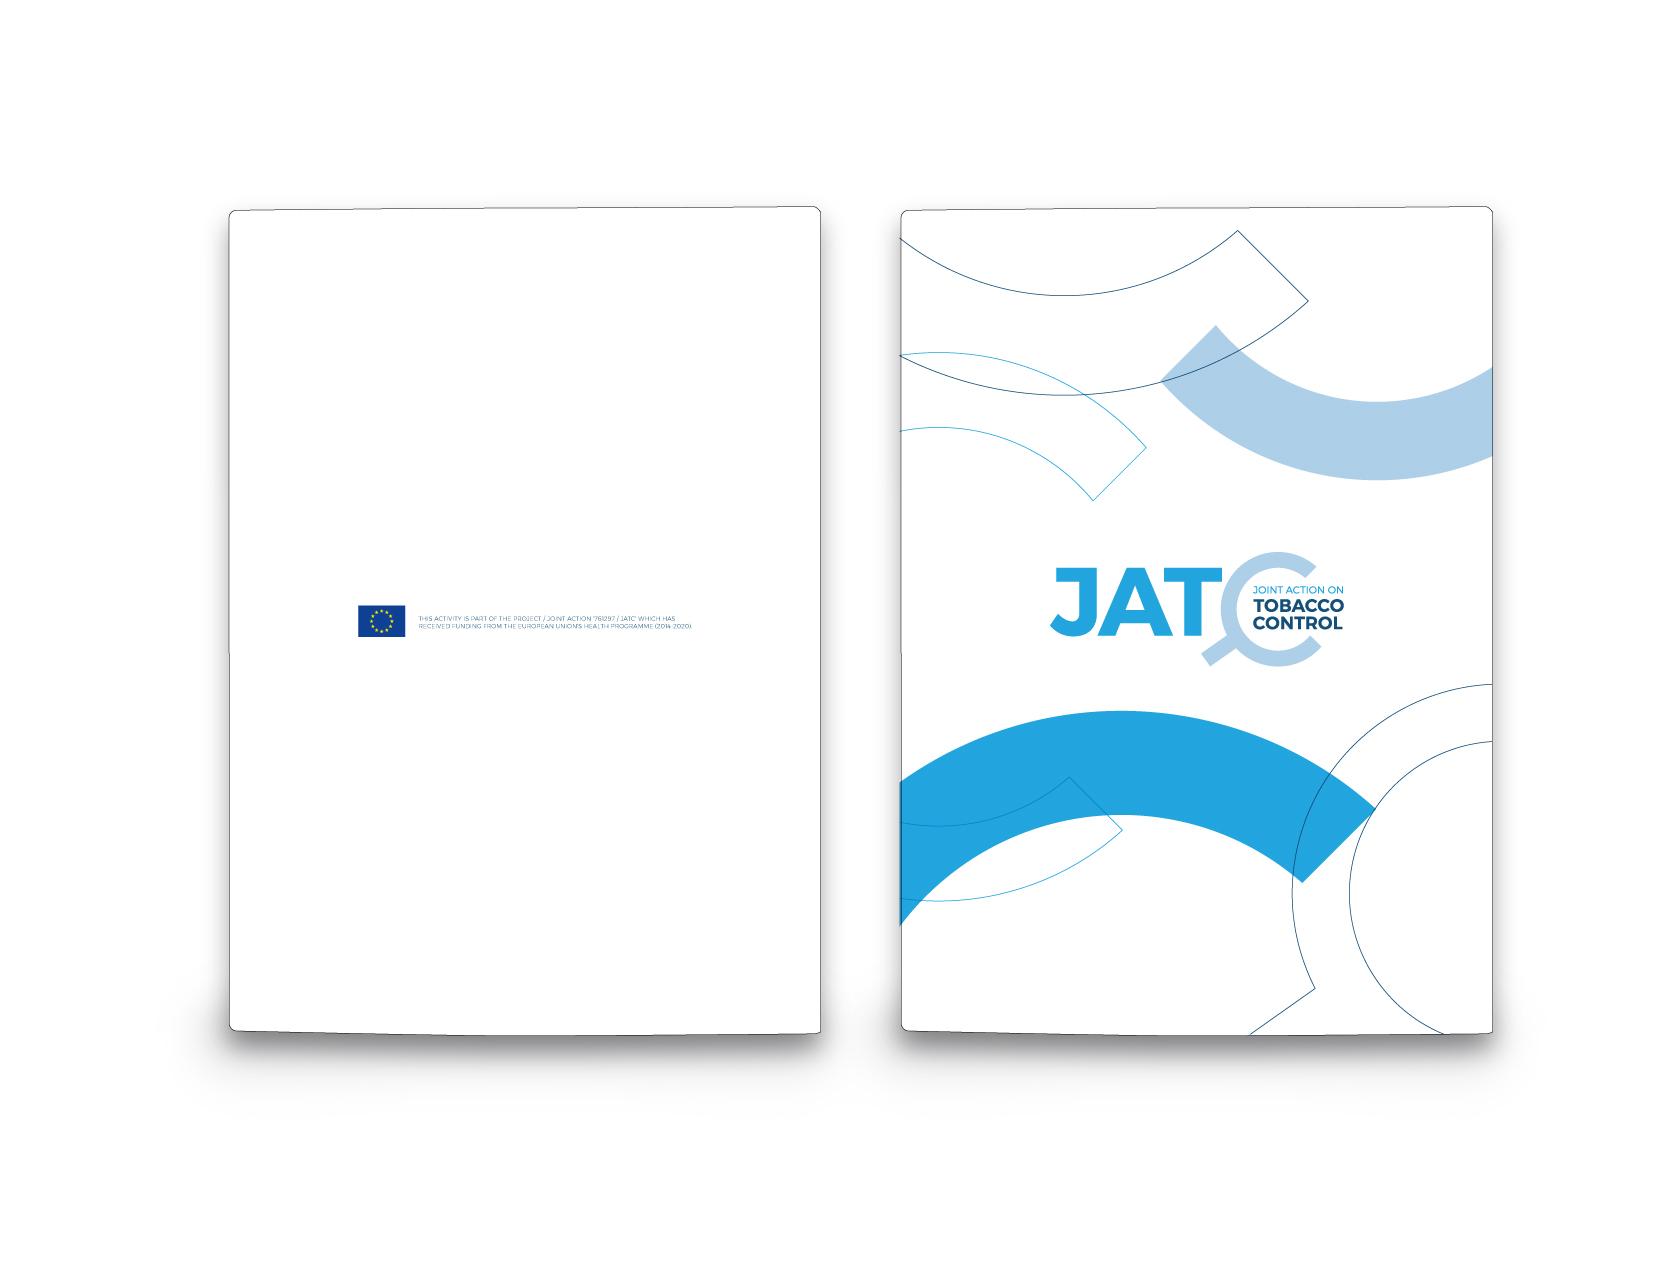 A3-DESIGN-JATC-FOLDER